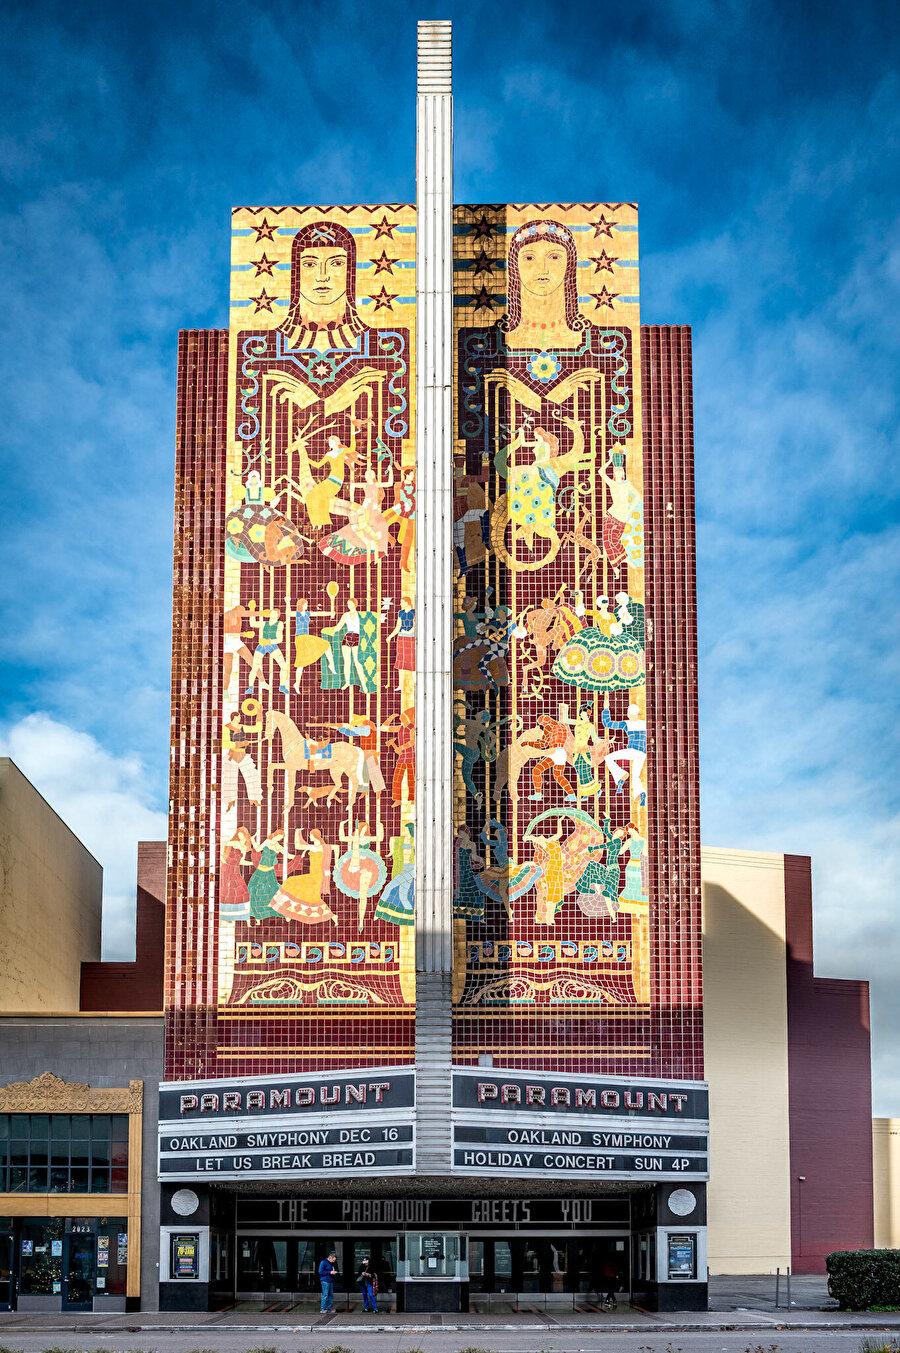 Paramount Tiyatro Binası, Oakland, Kalifornia, 1929.